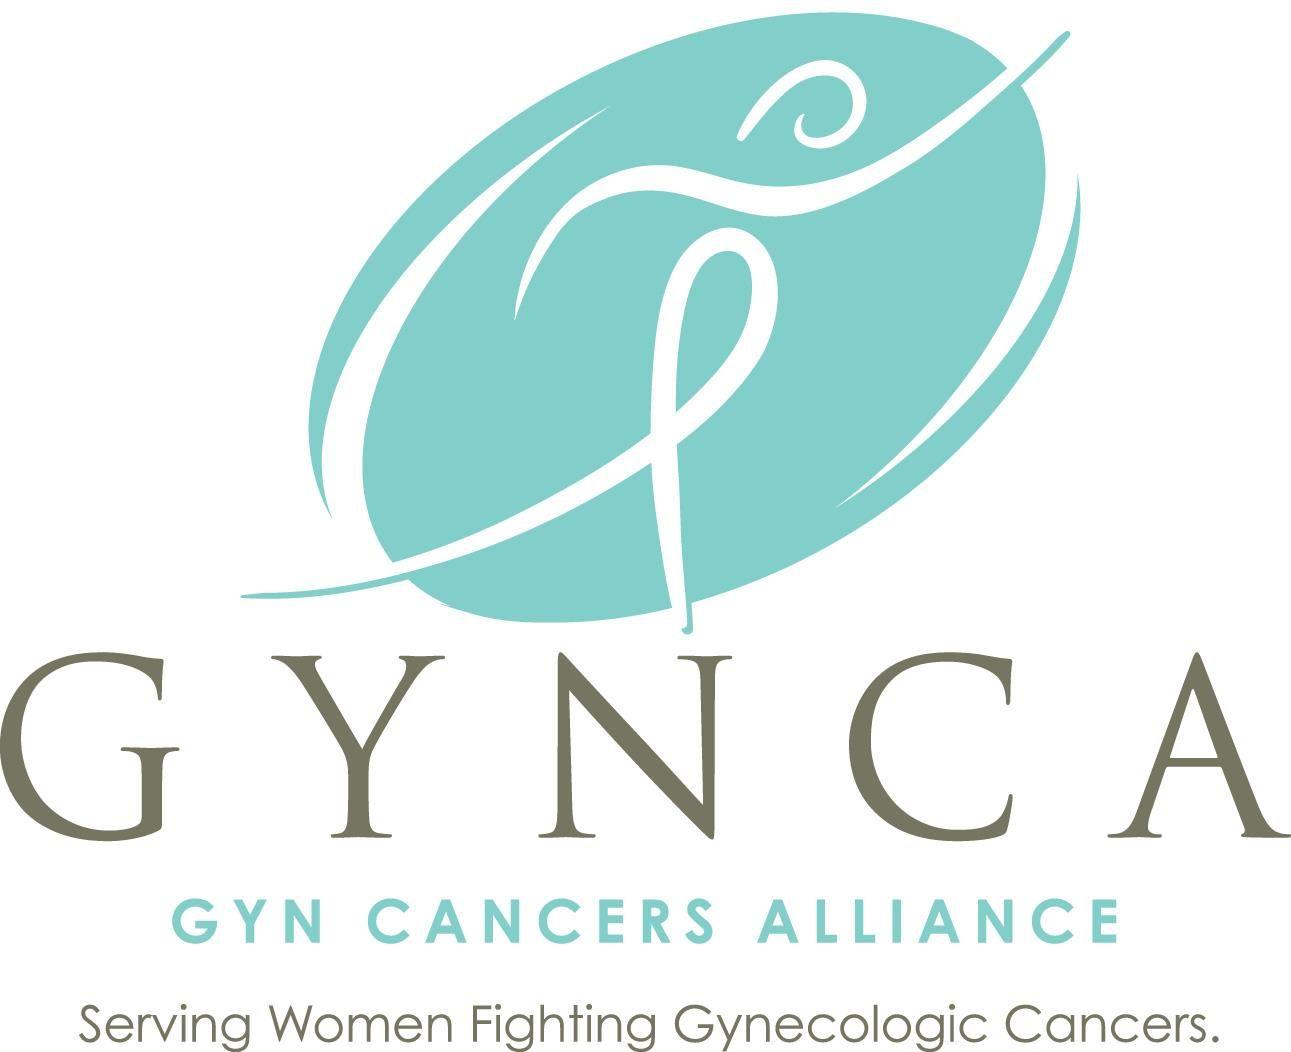 Gyn Cancers Alliance (MO) - GYNCA is a one-of-a-kind